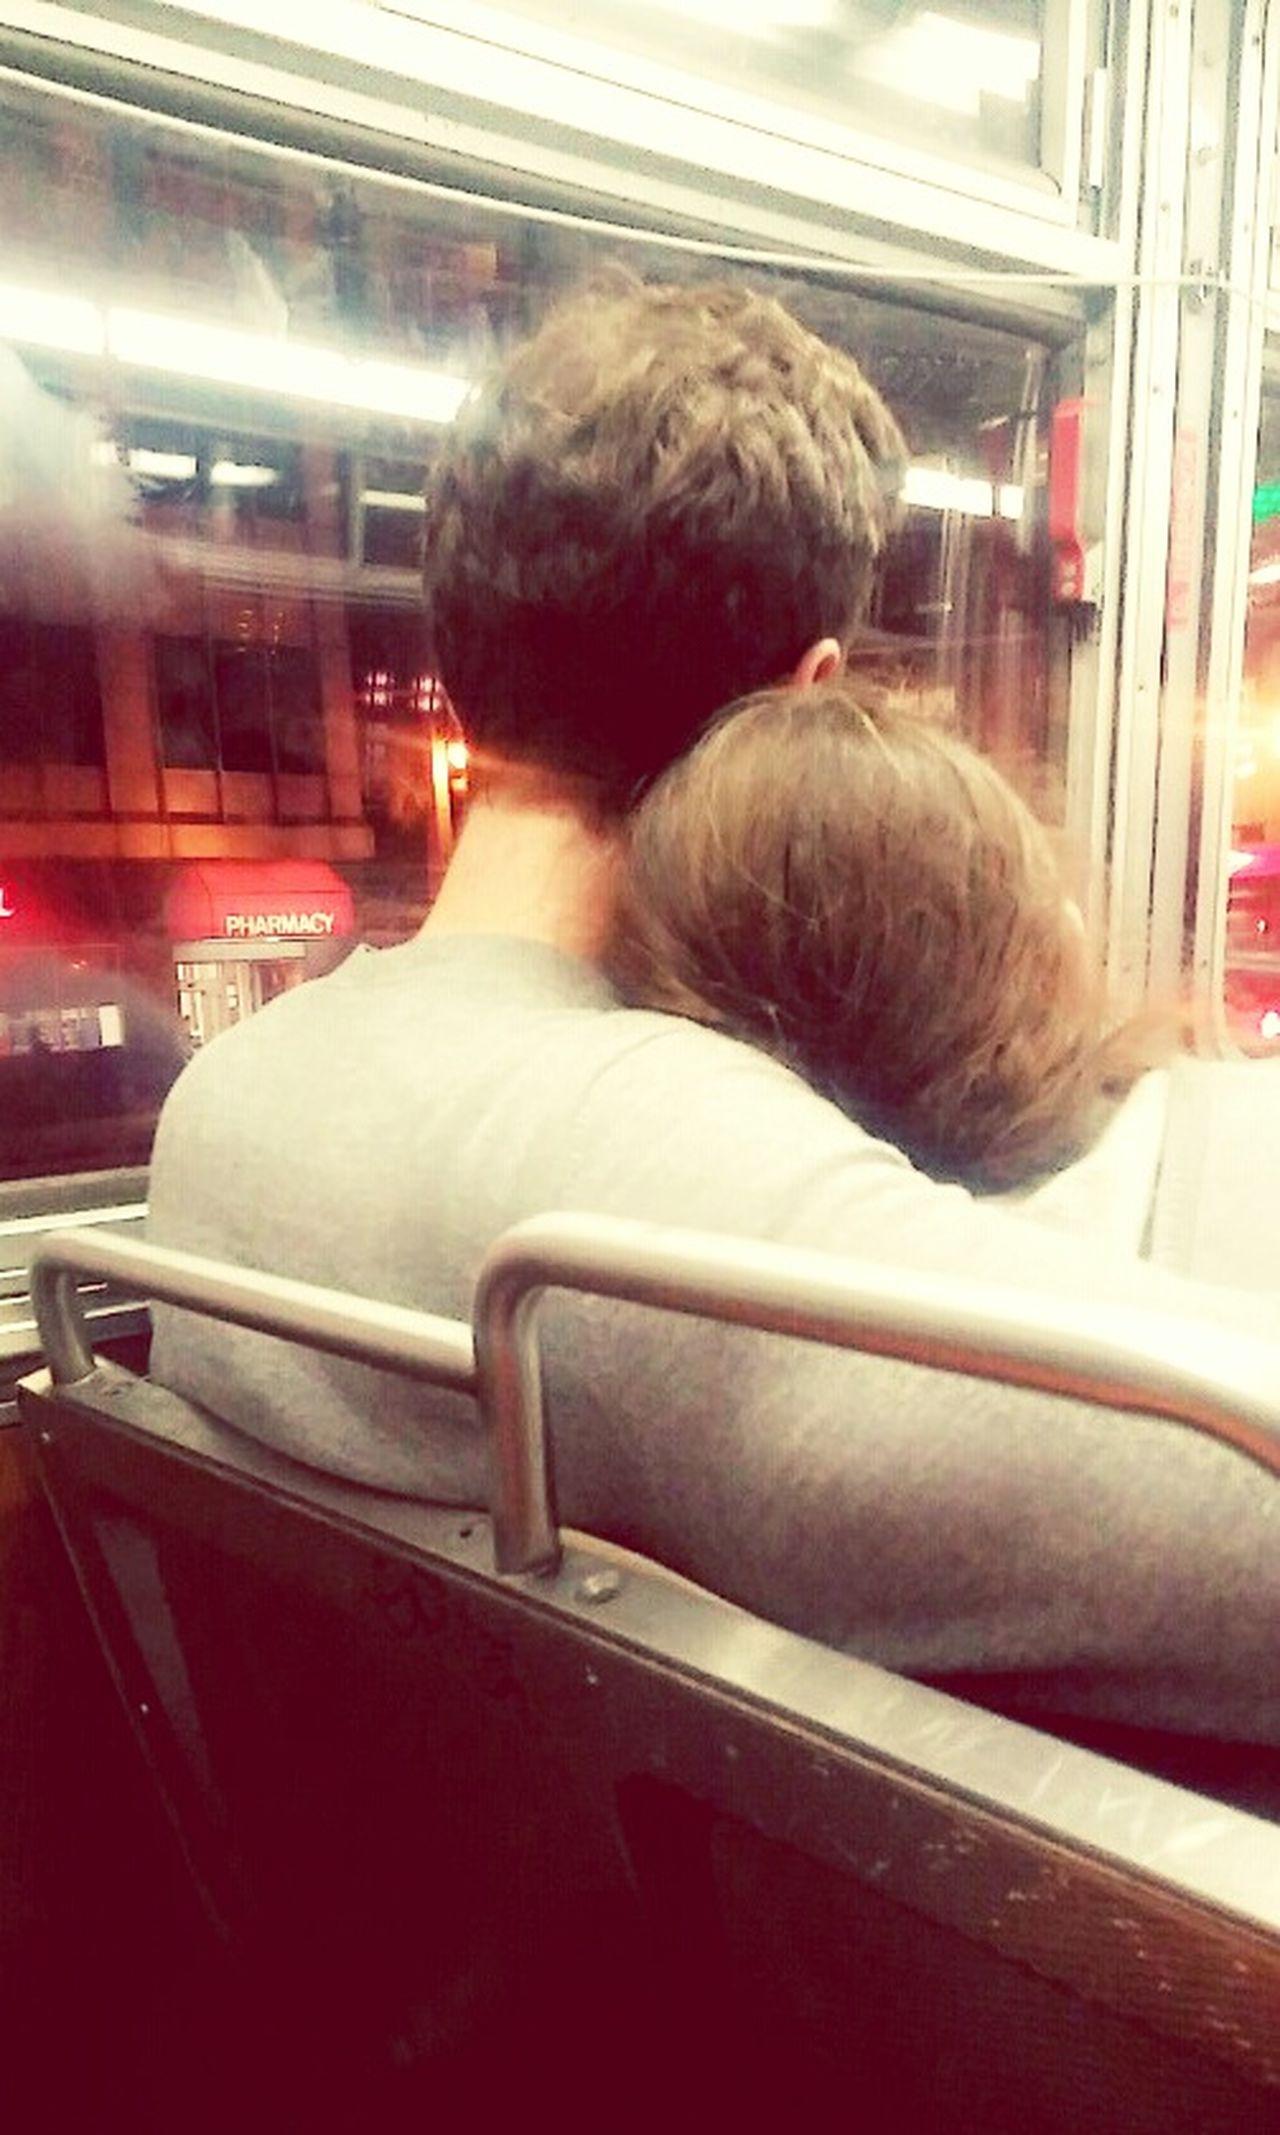 Love ♥ On The Bus Human Relations Up Close Street Photography Street Photographer-2016 Eyem Awards Photo Jurnalist Eyem 2016 Mix Yourself A Good Time